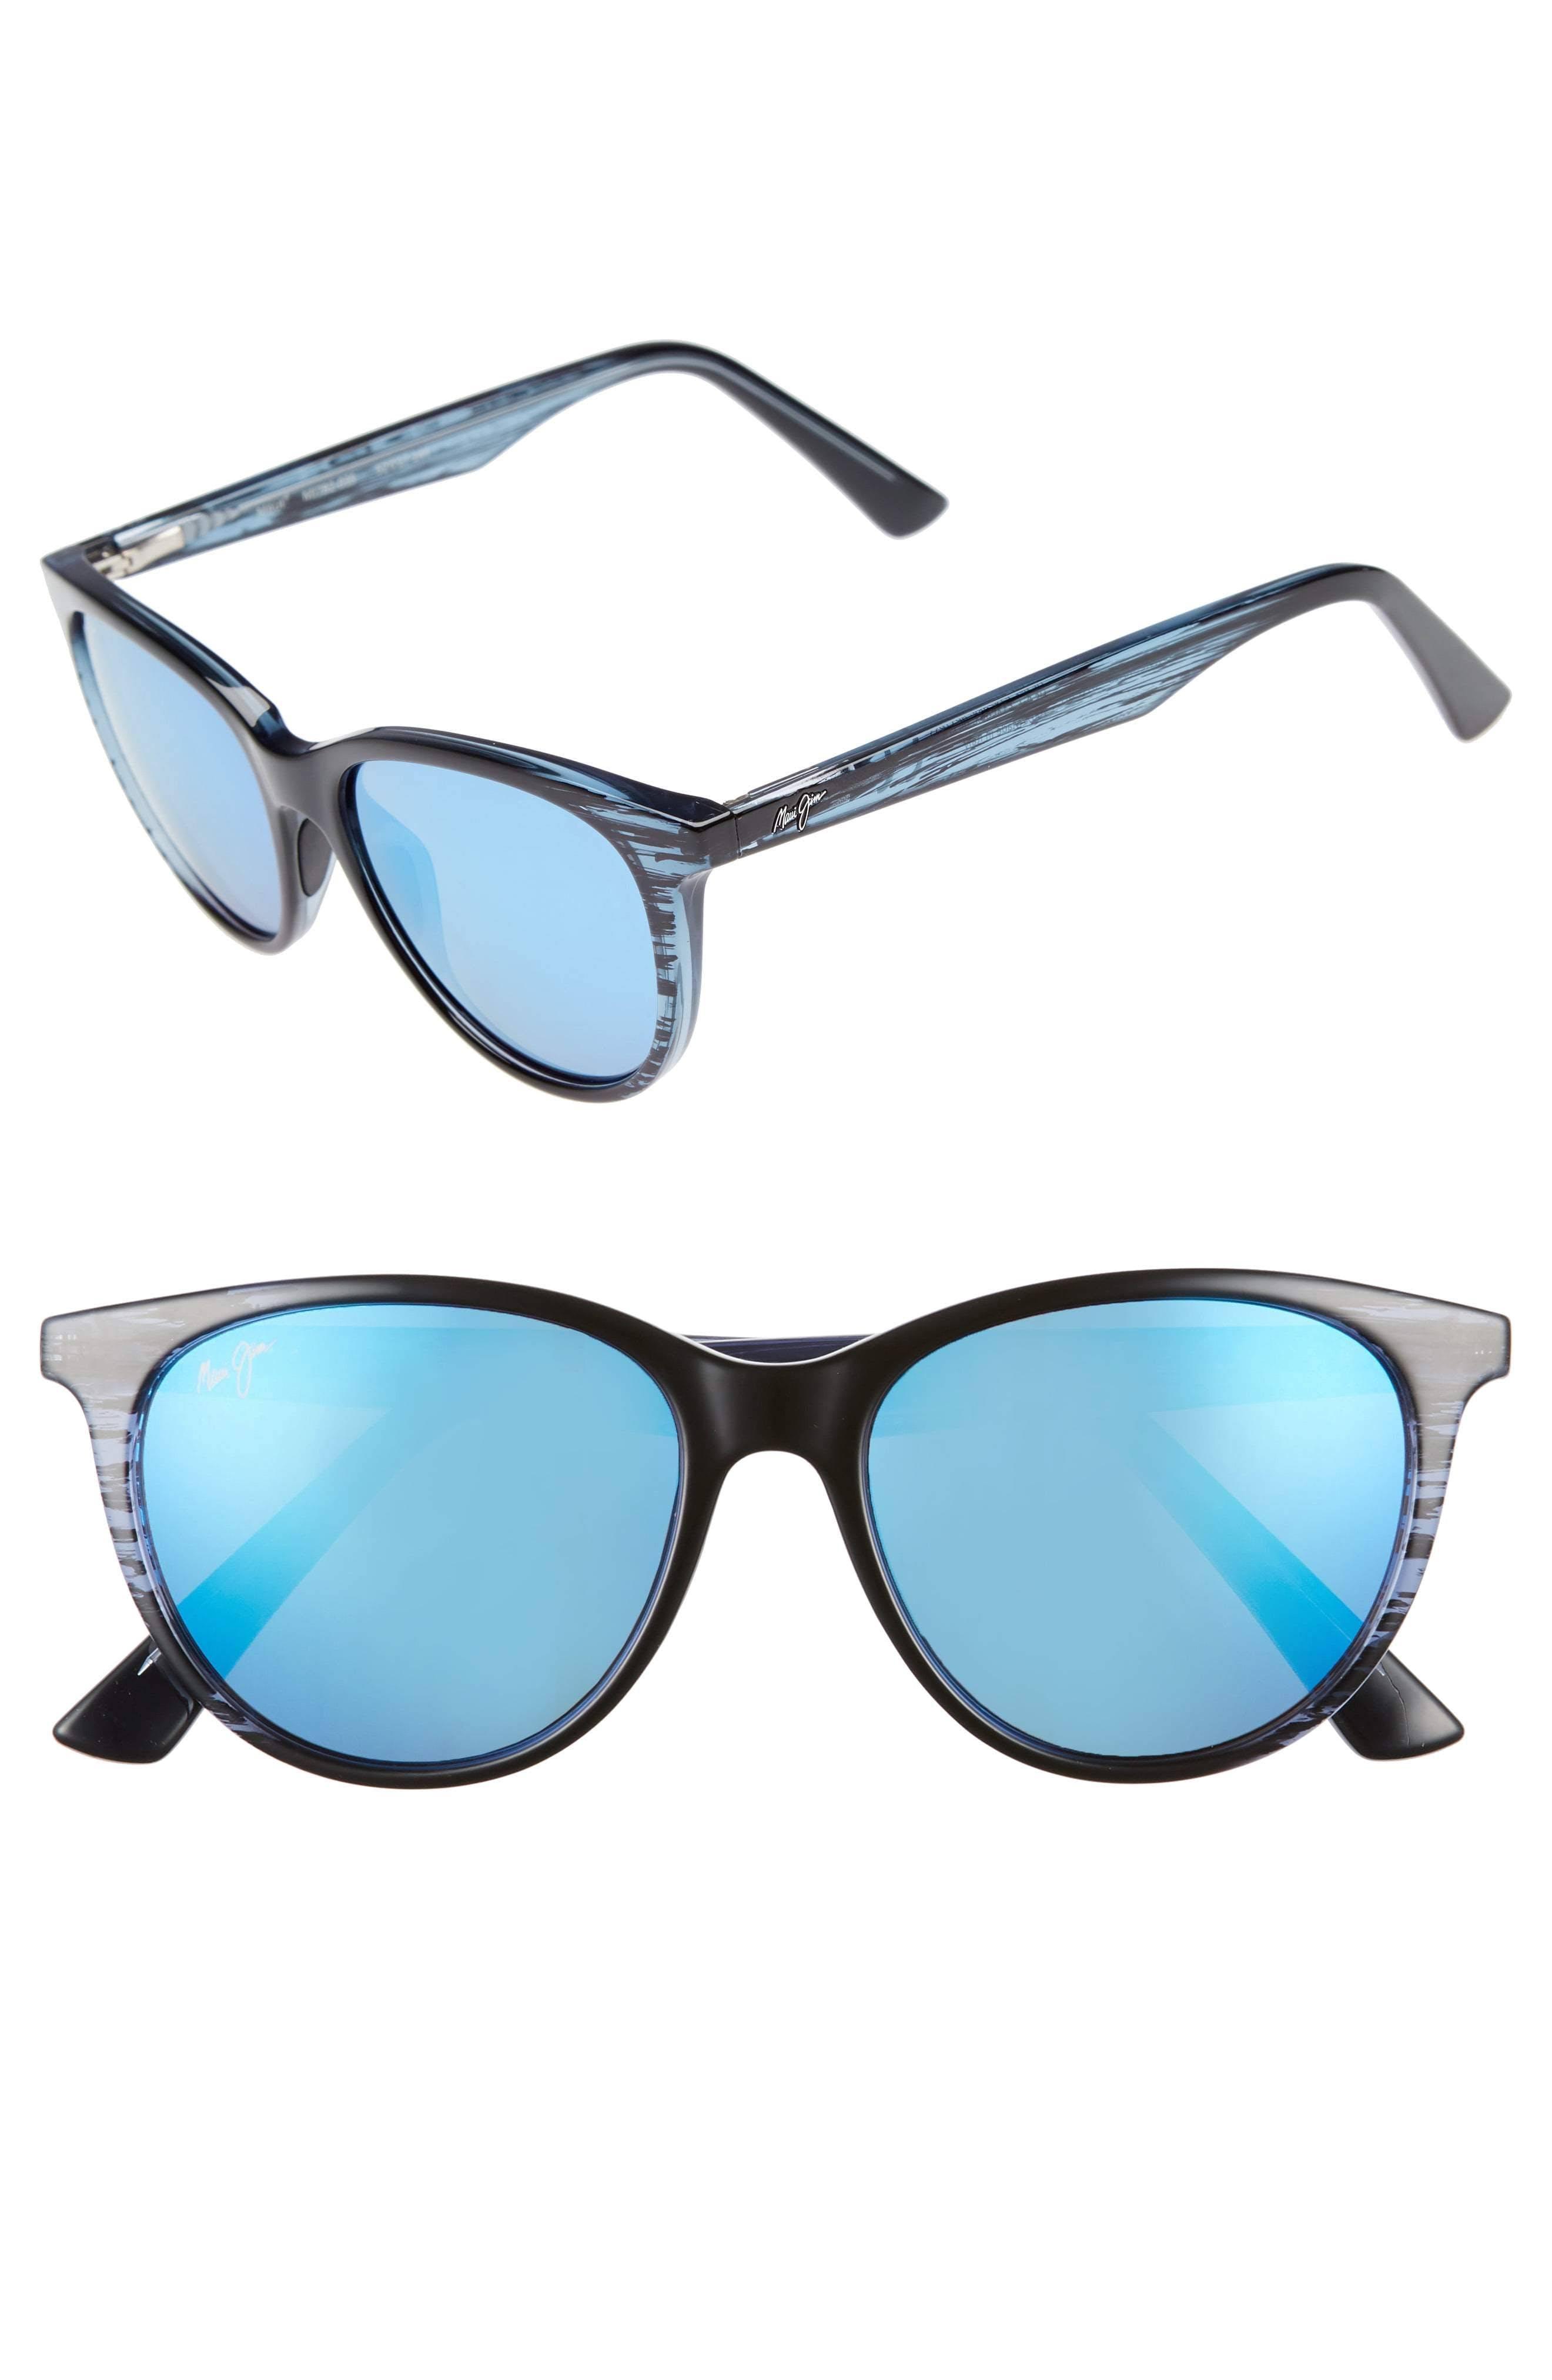 Maui Jim Cathedrals Sunglasses Blue Black Stripe / Blue Hawaii